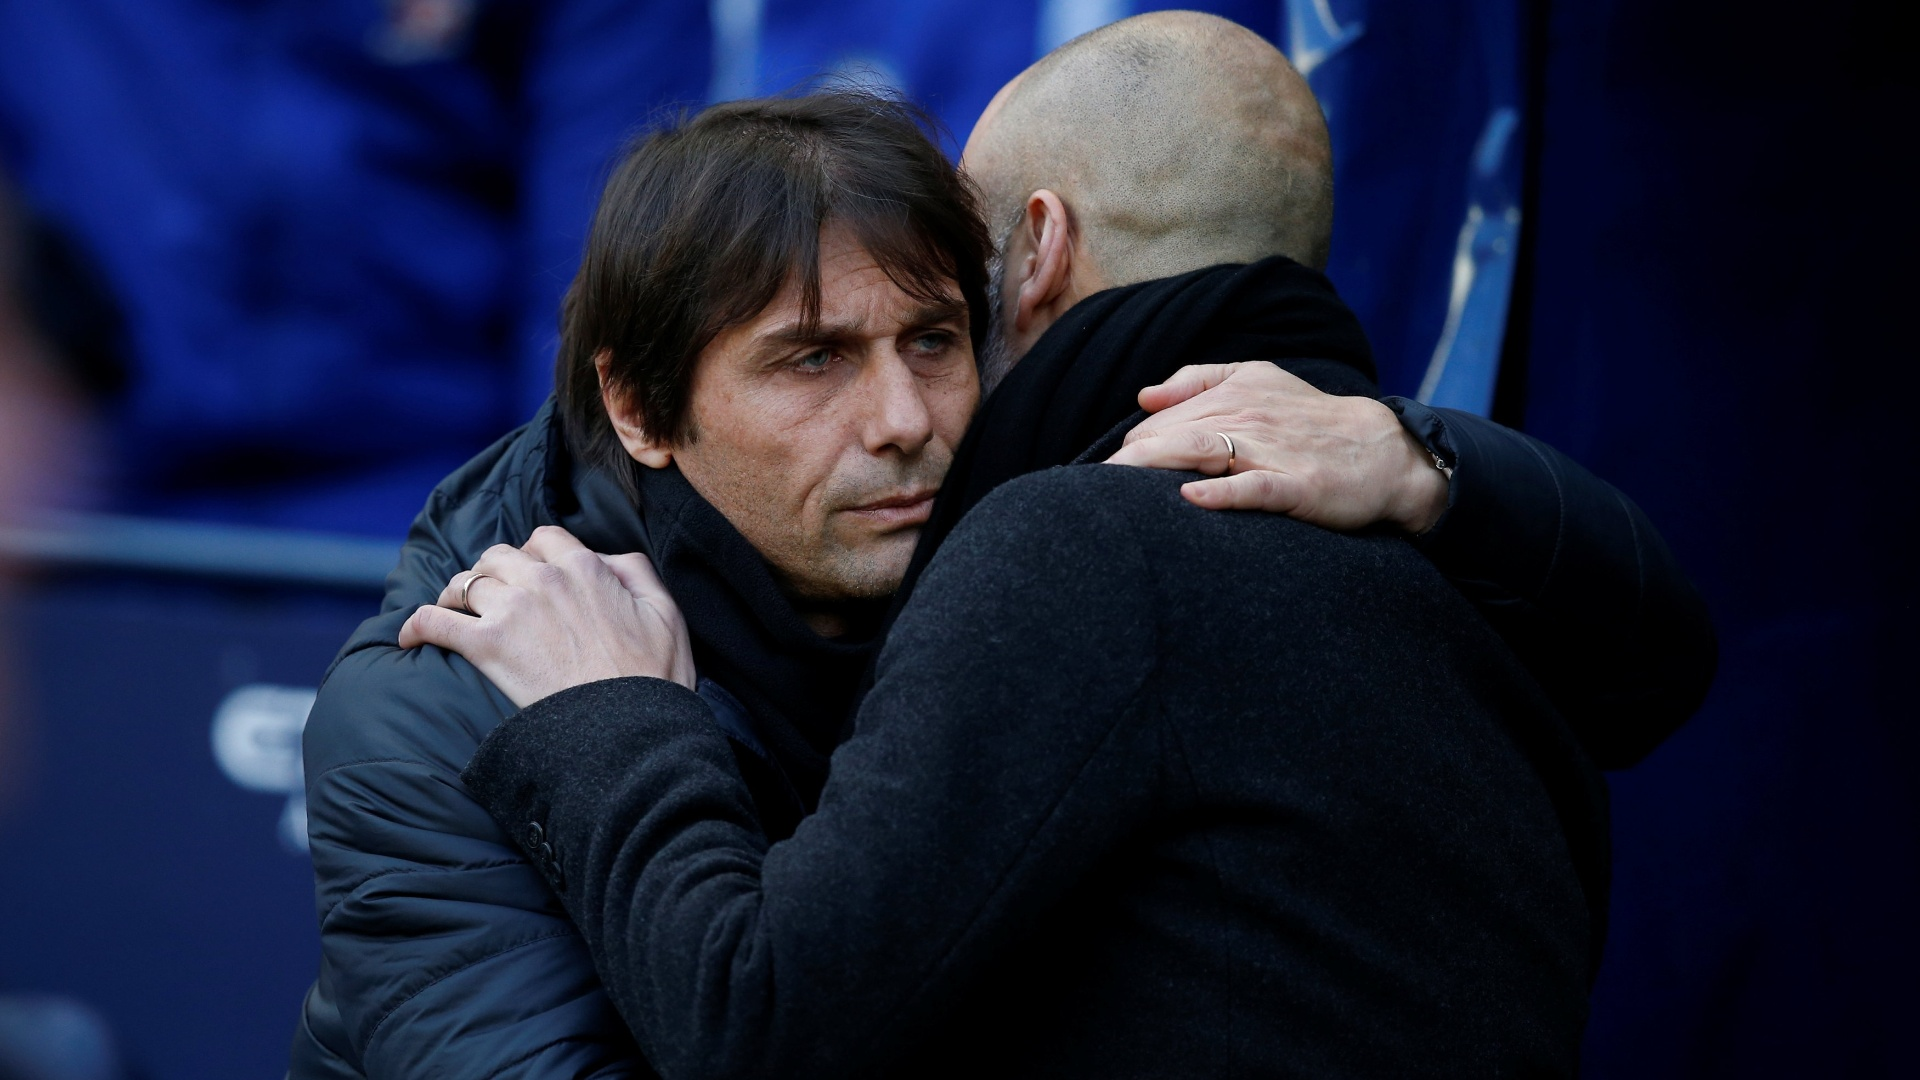 Manchester City Contra Chelsea: UOL Esporte